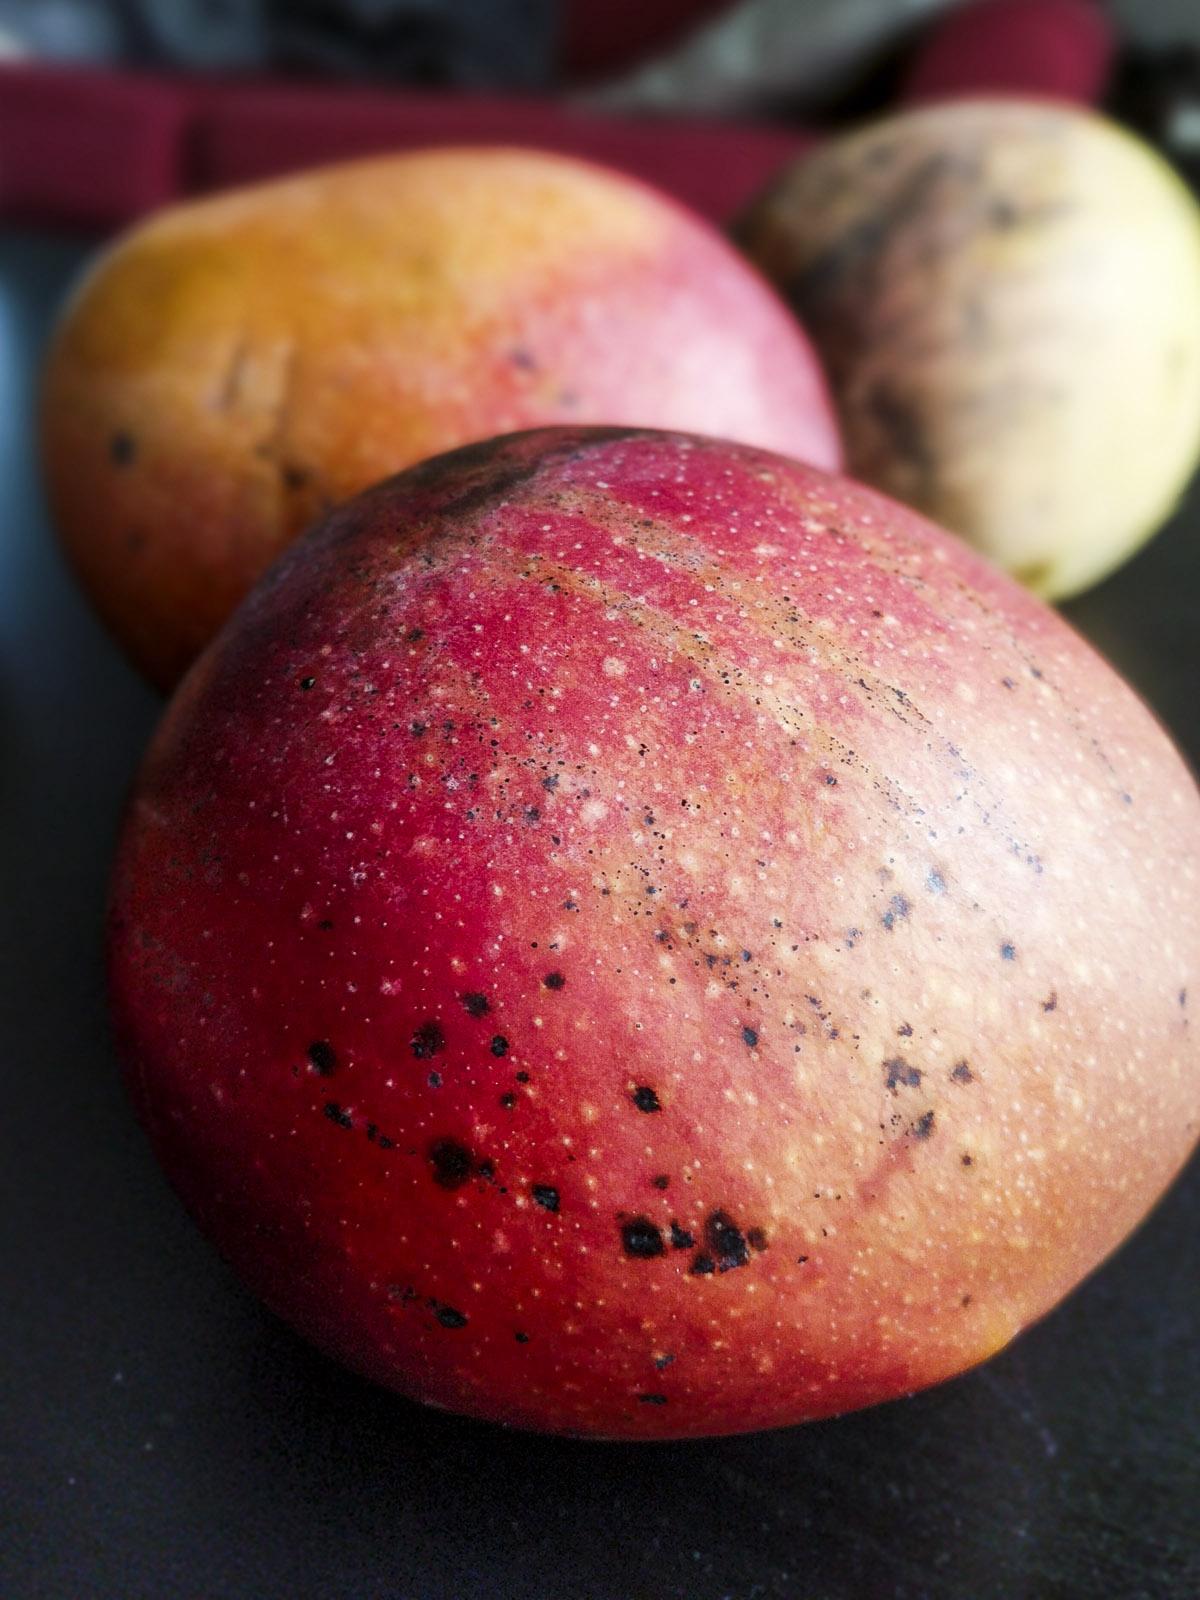 July is definitely Mango Month